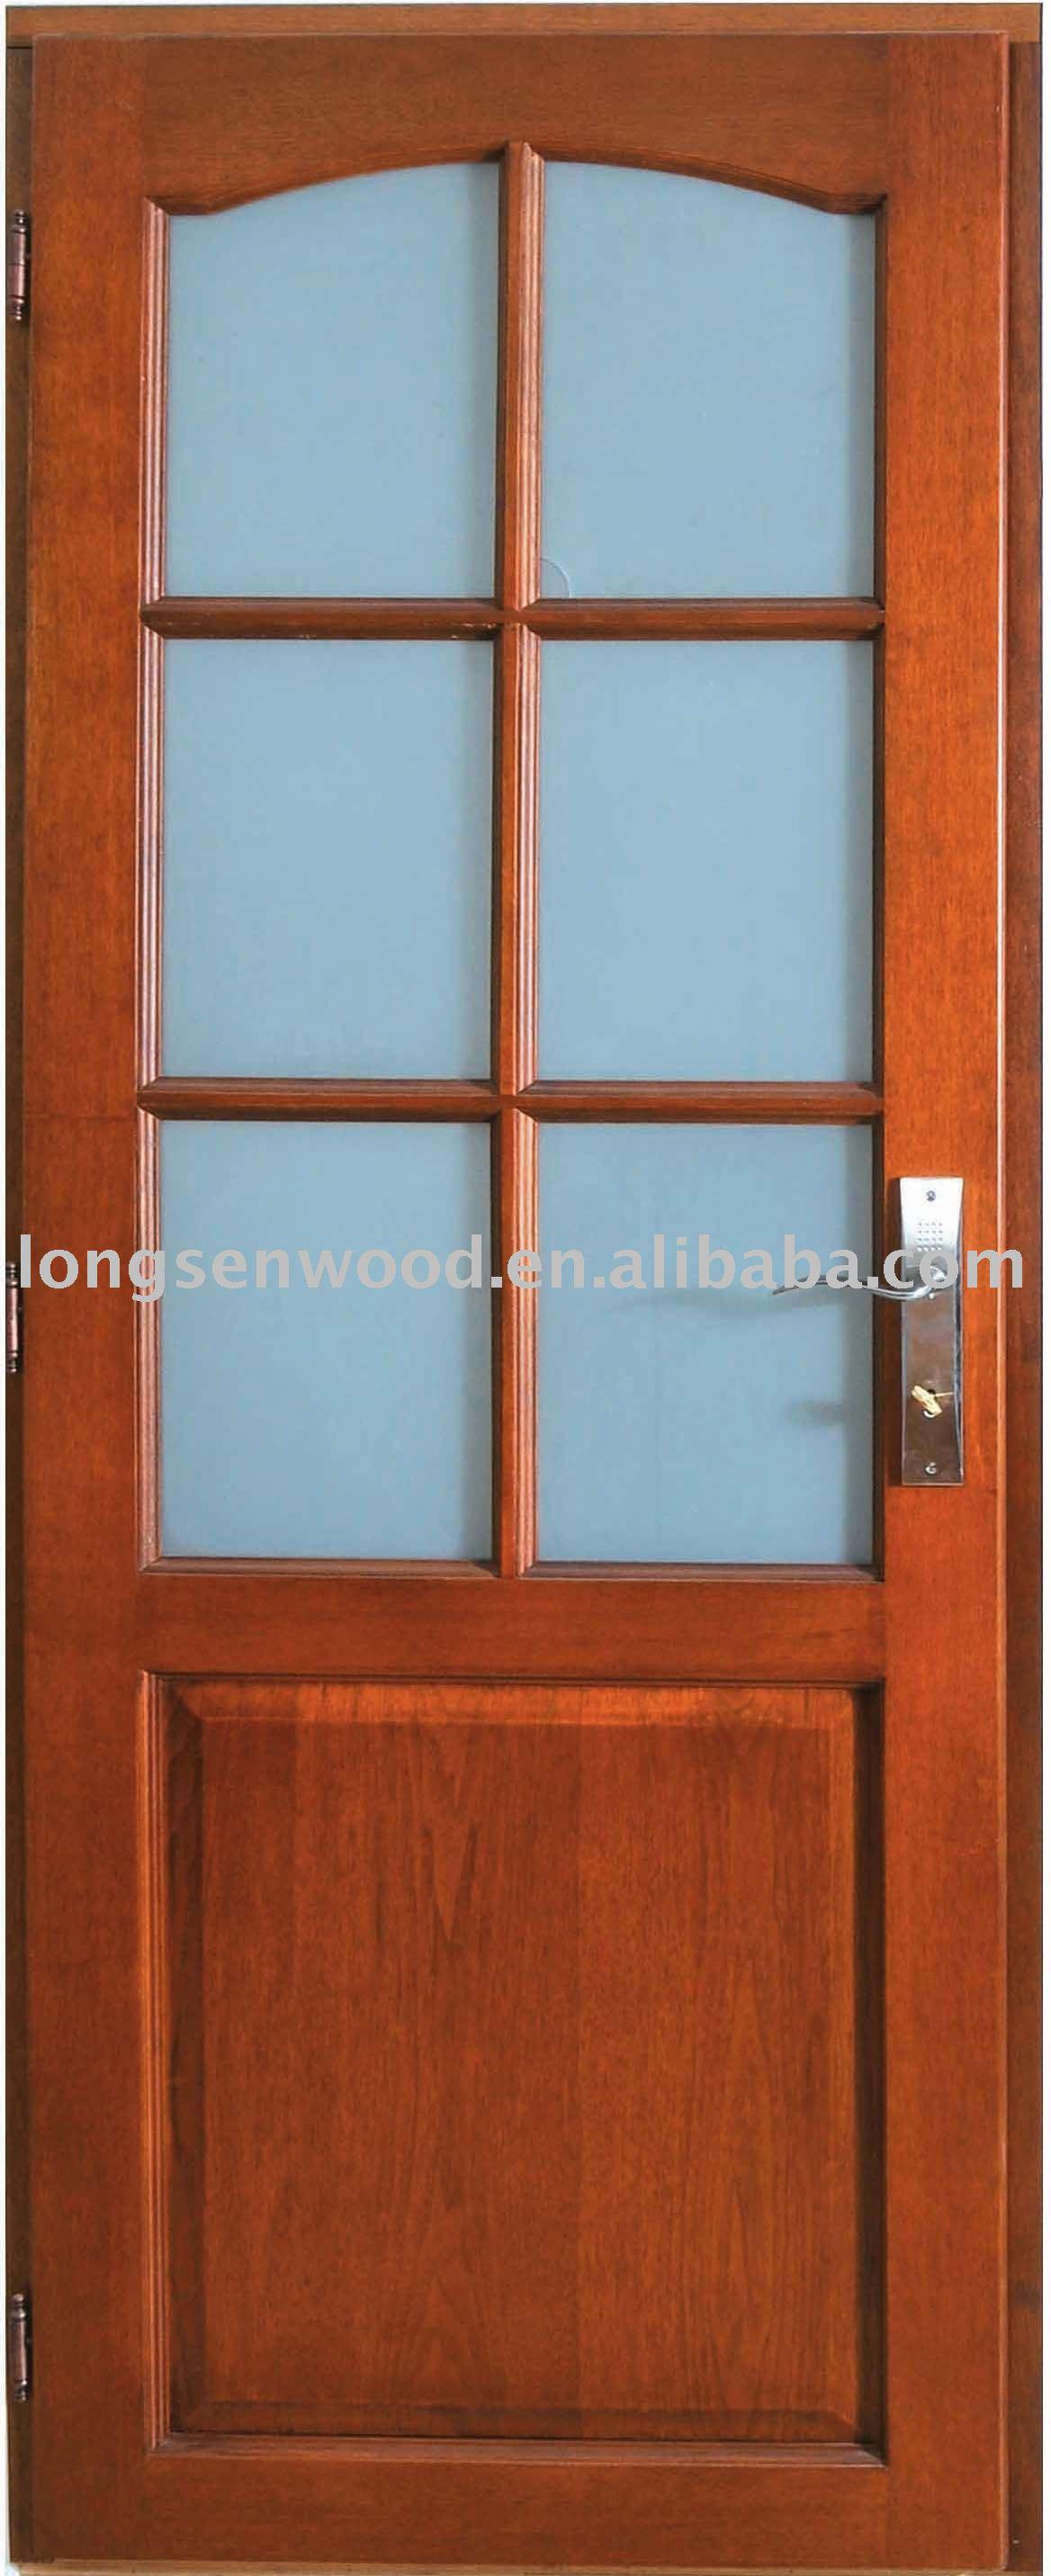 Cristal de la puerta marco de madera puertas for Puertas de entrada madera y cristal